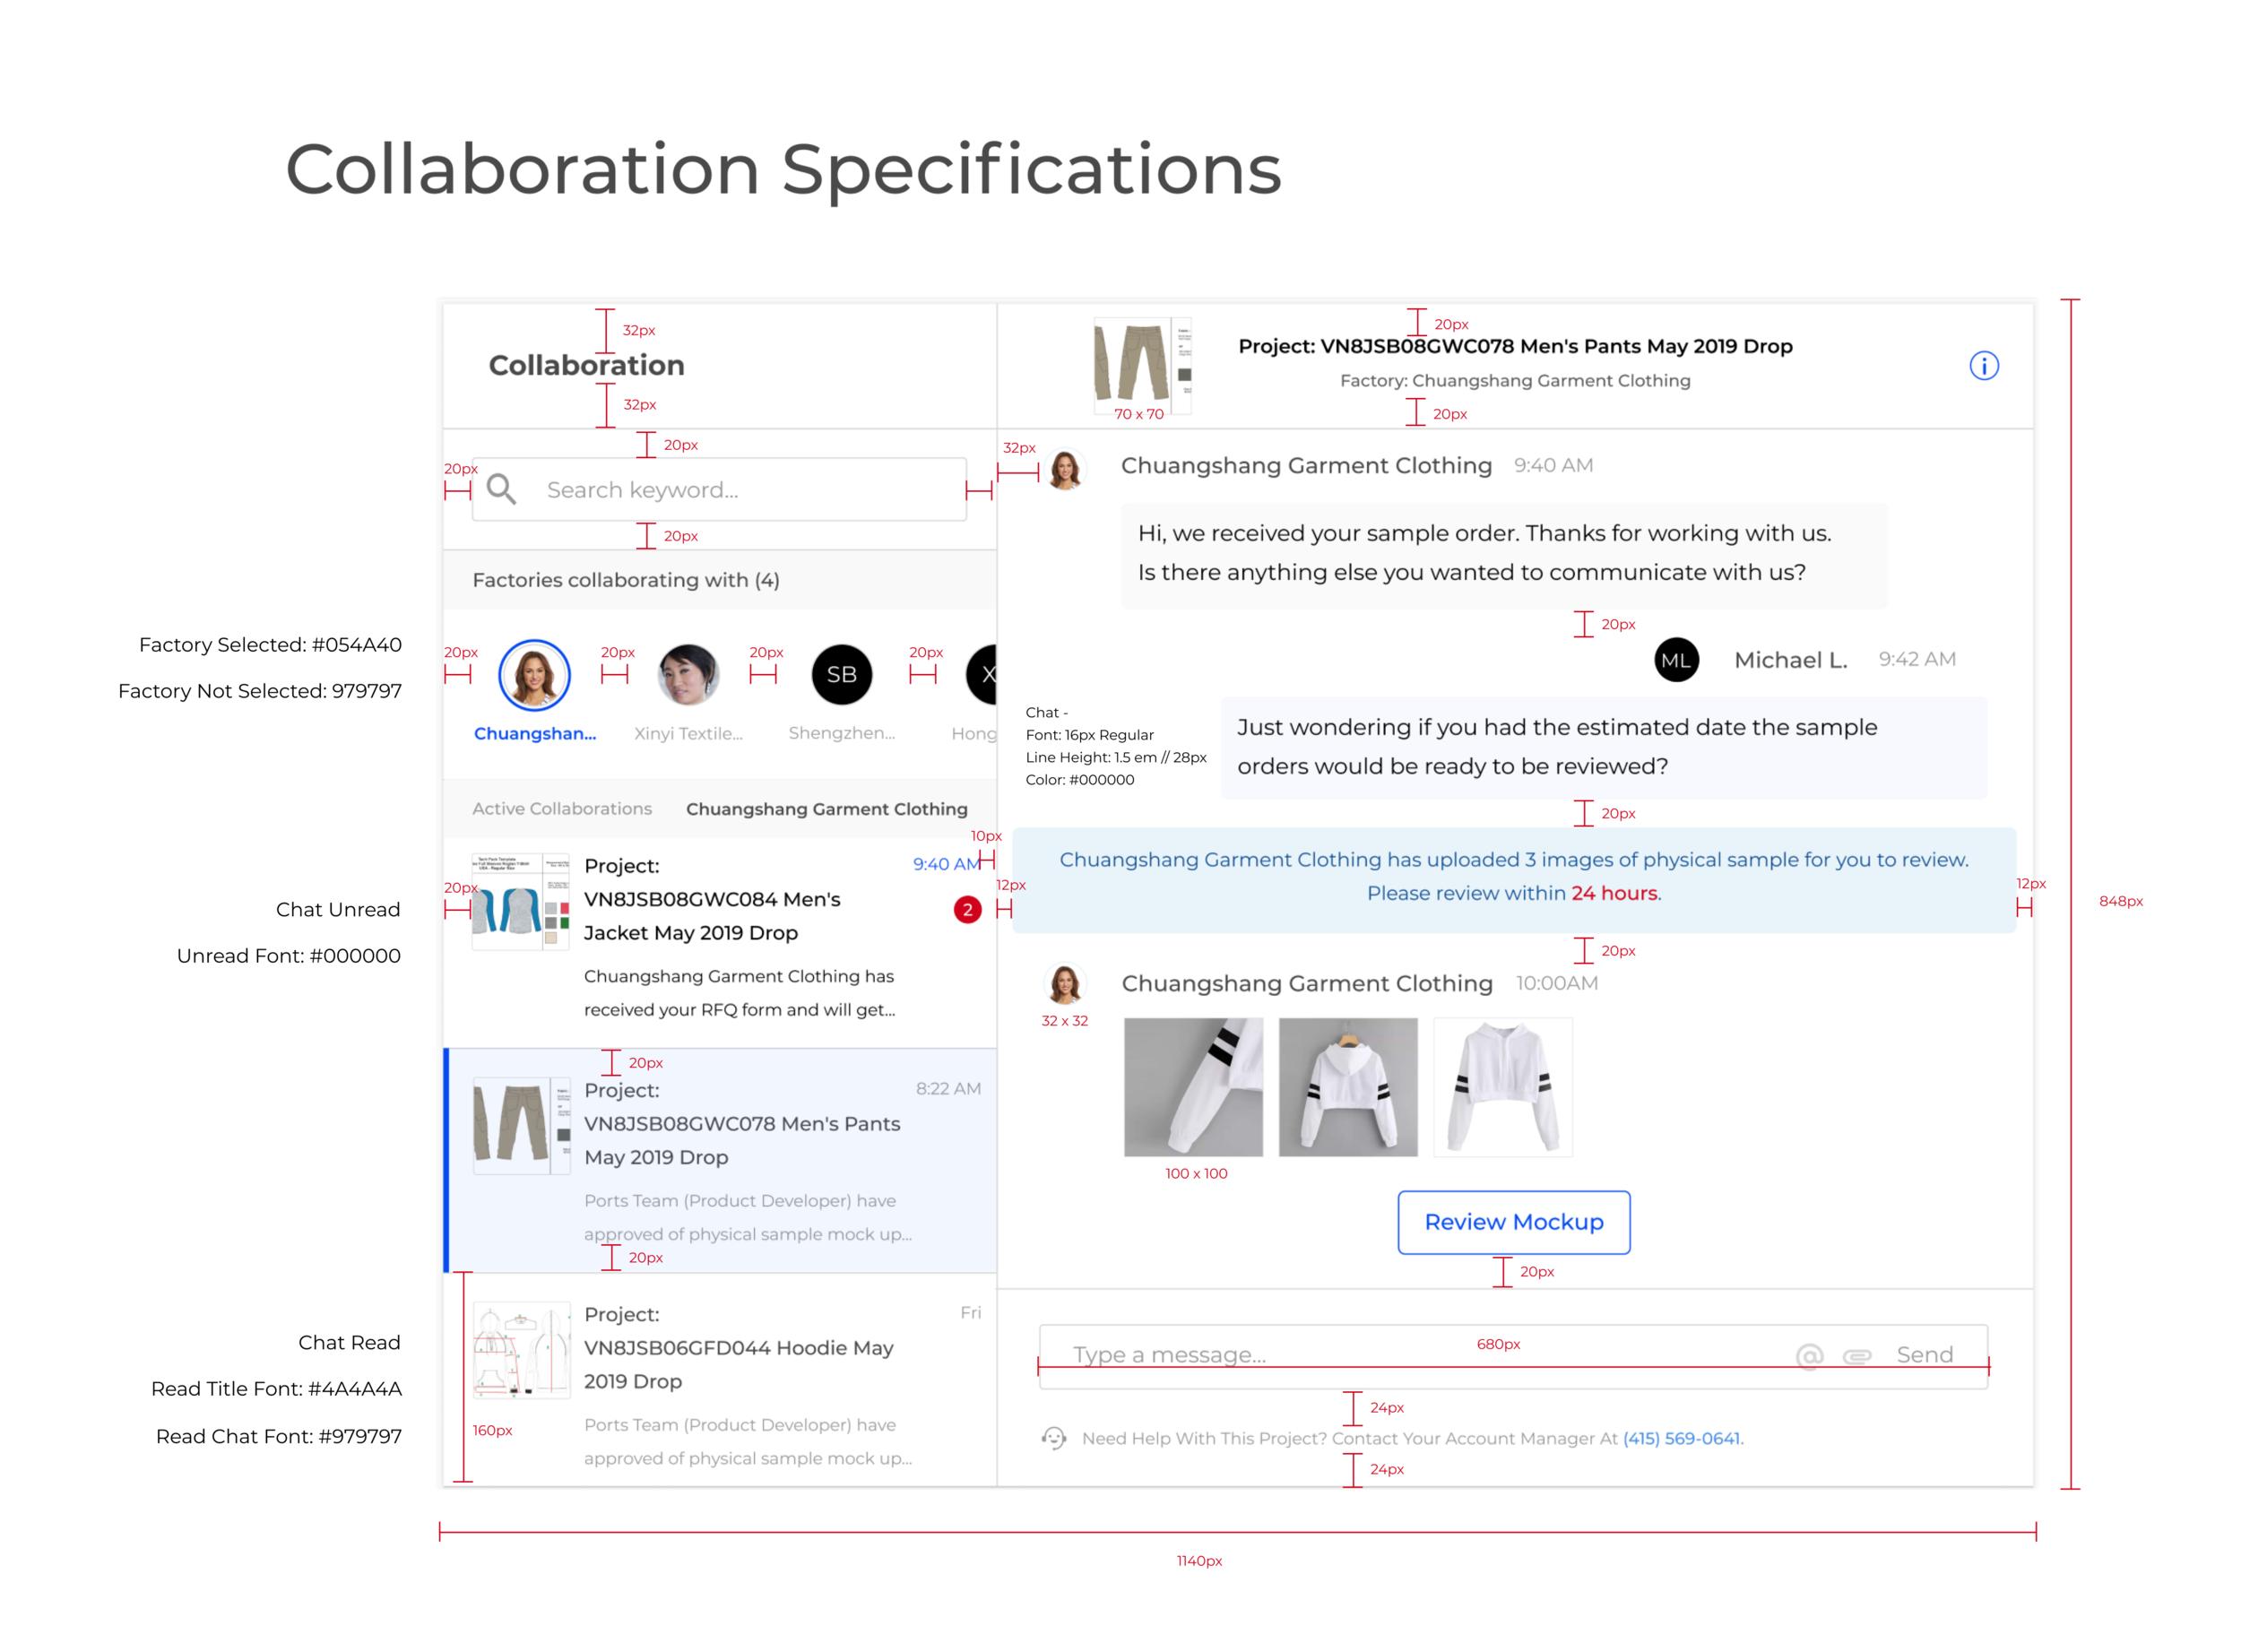 CollaborationSpecs.png